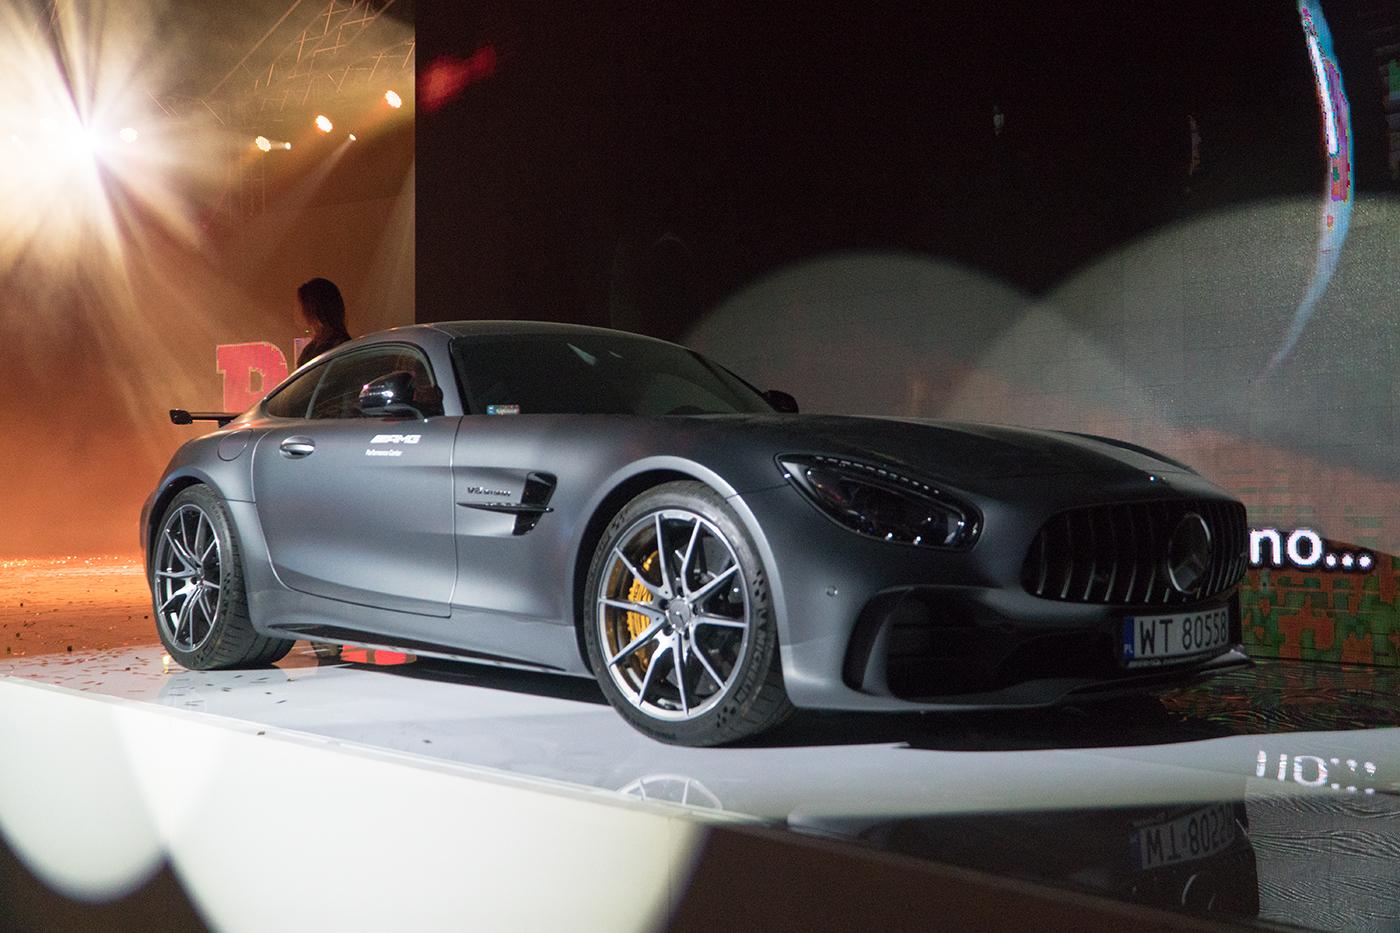 Samochód Roku Playboya Mercedes-AMG G TR